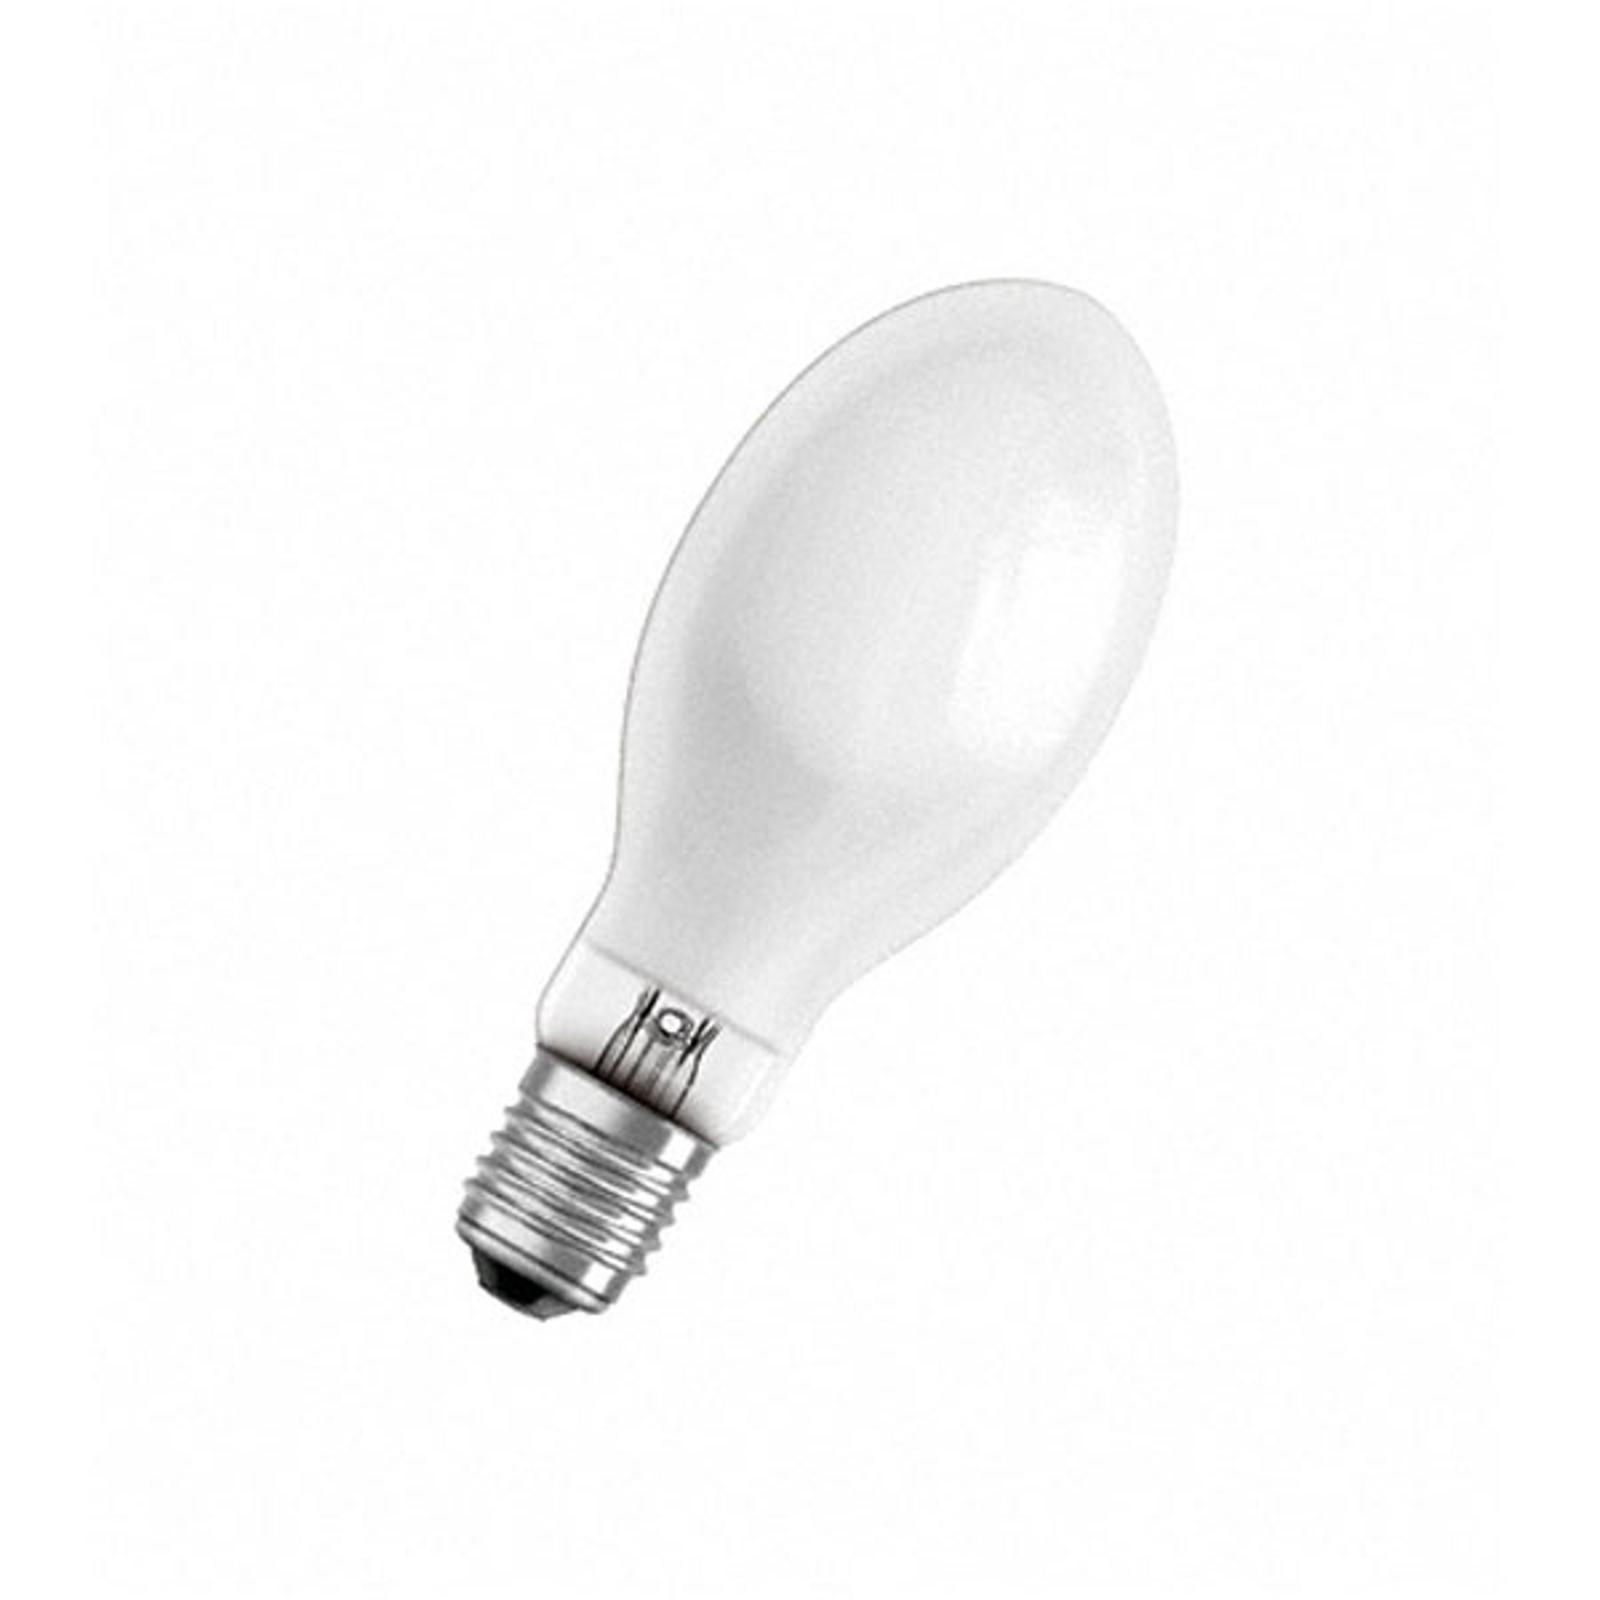 E40 400W D Pro Powerstar HQI-E halogenlampa